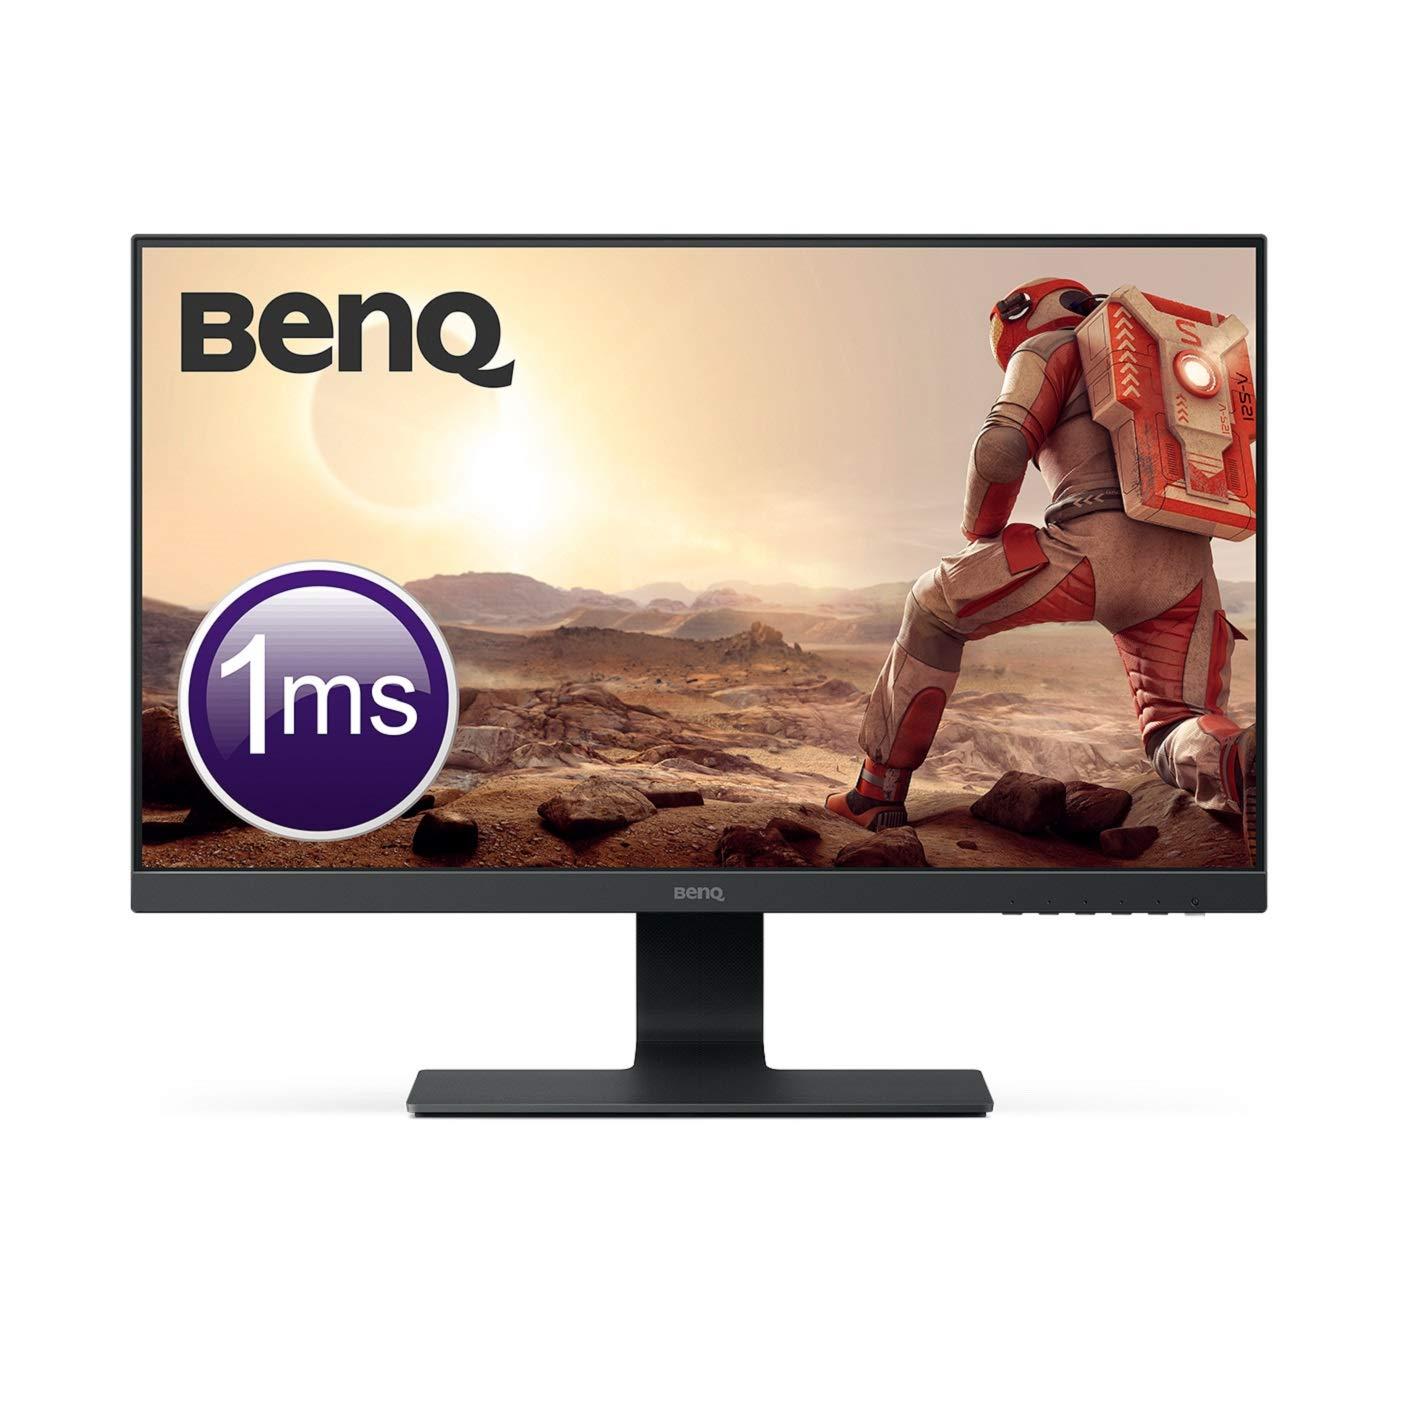 BenQ GL2580HM 24.5 Inch FHD 1080p 1ms Eye care LED Gaming Monitor, HDMI, Speaker , Black £95.99 @ Amazon